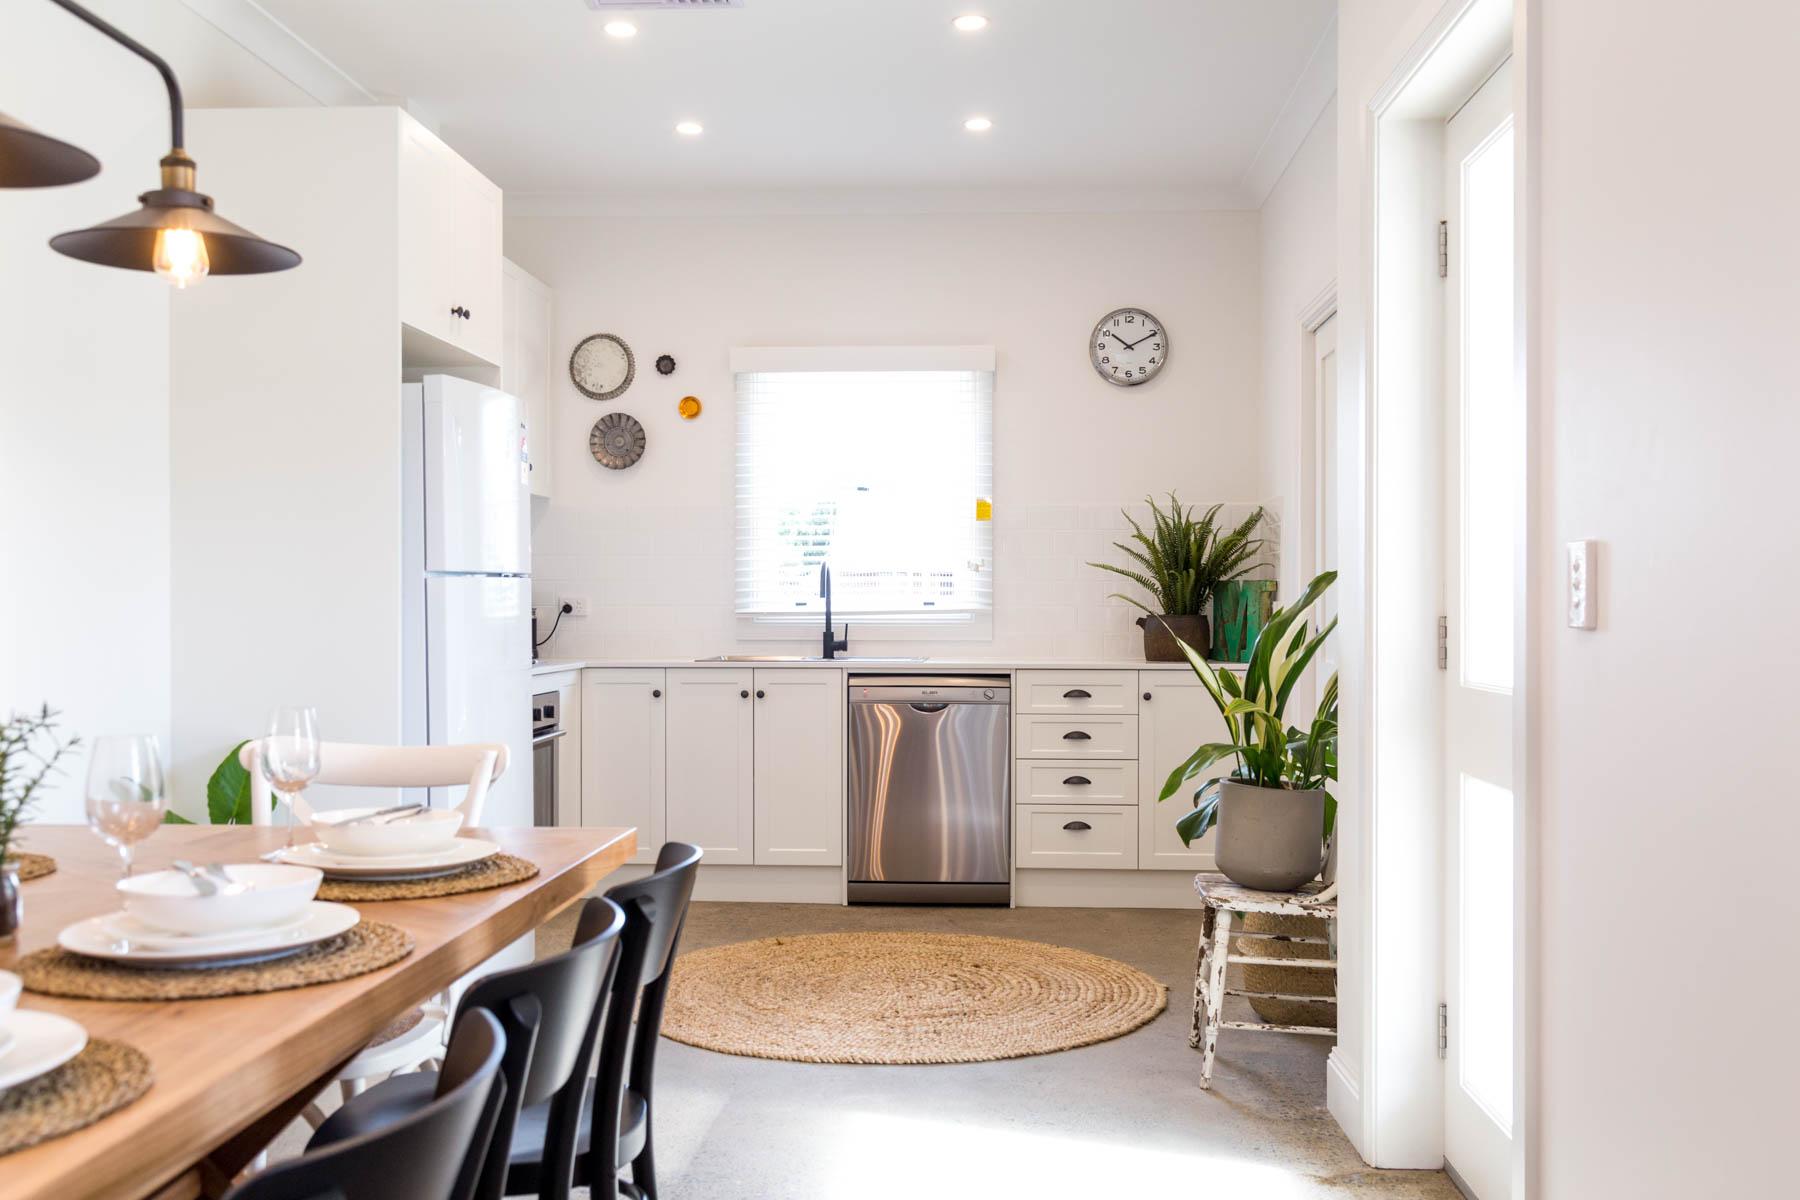 Renovation, Restoration, Extensions, Design, Builders, Goolwa, Fleurieu, Cottage, Award Winning, Kitchen